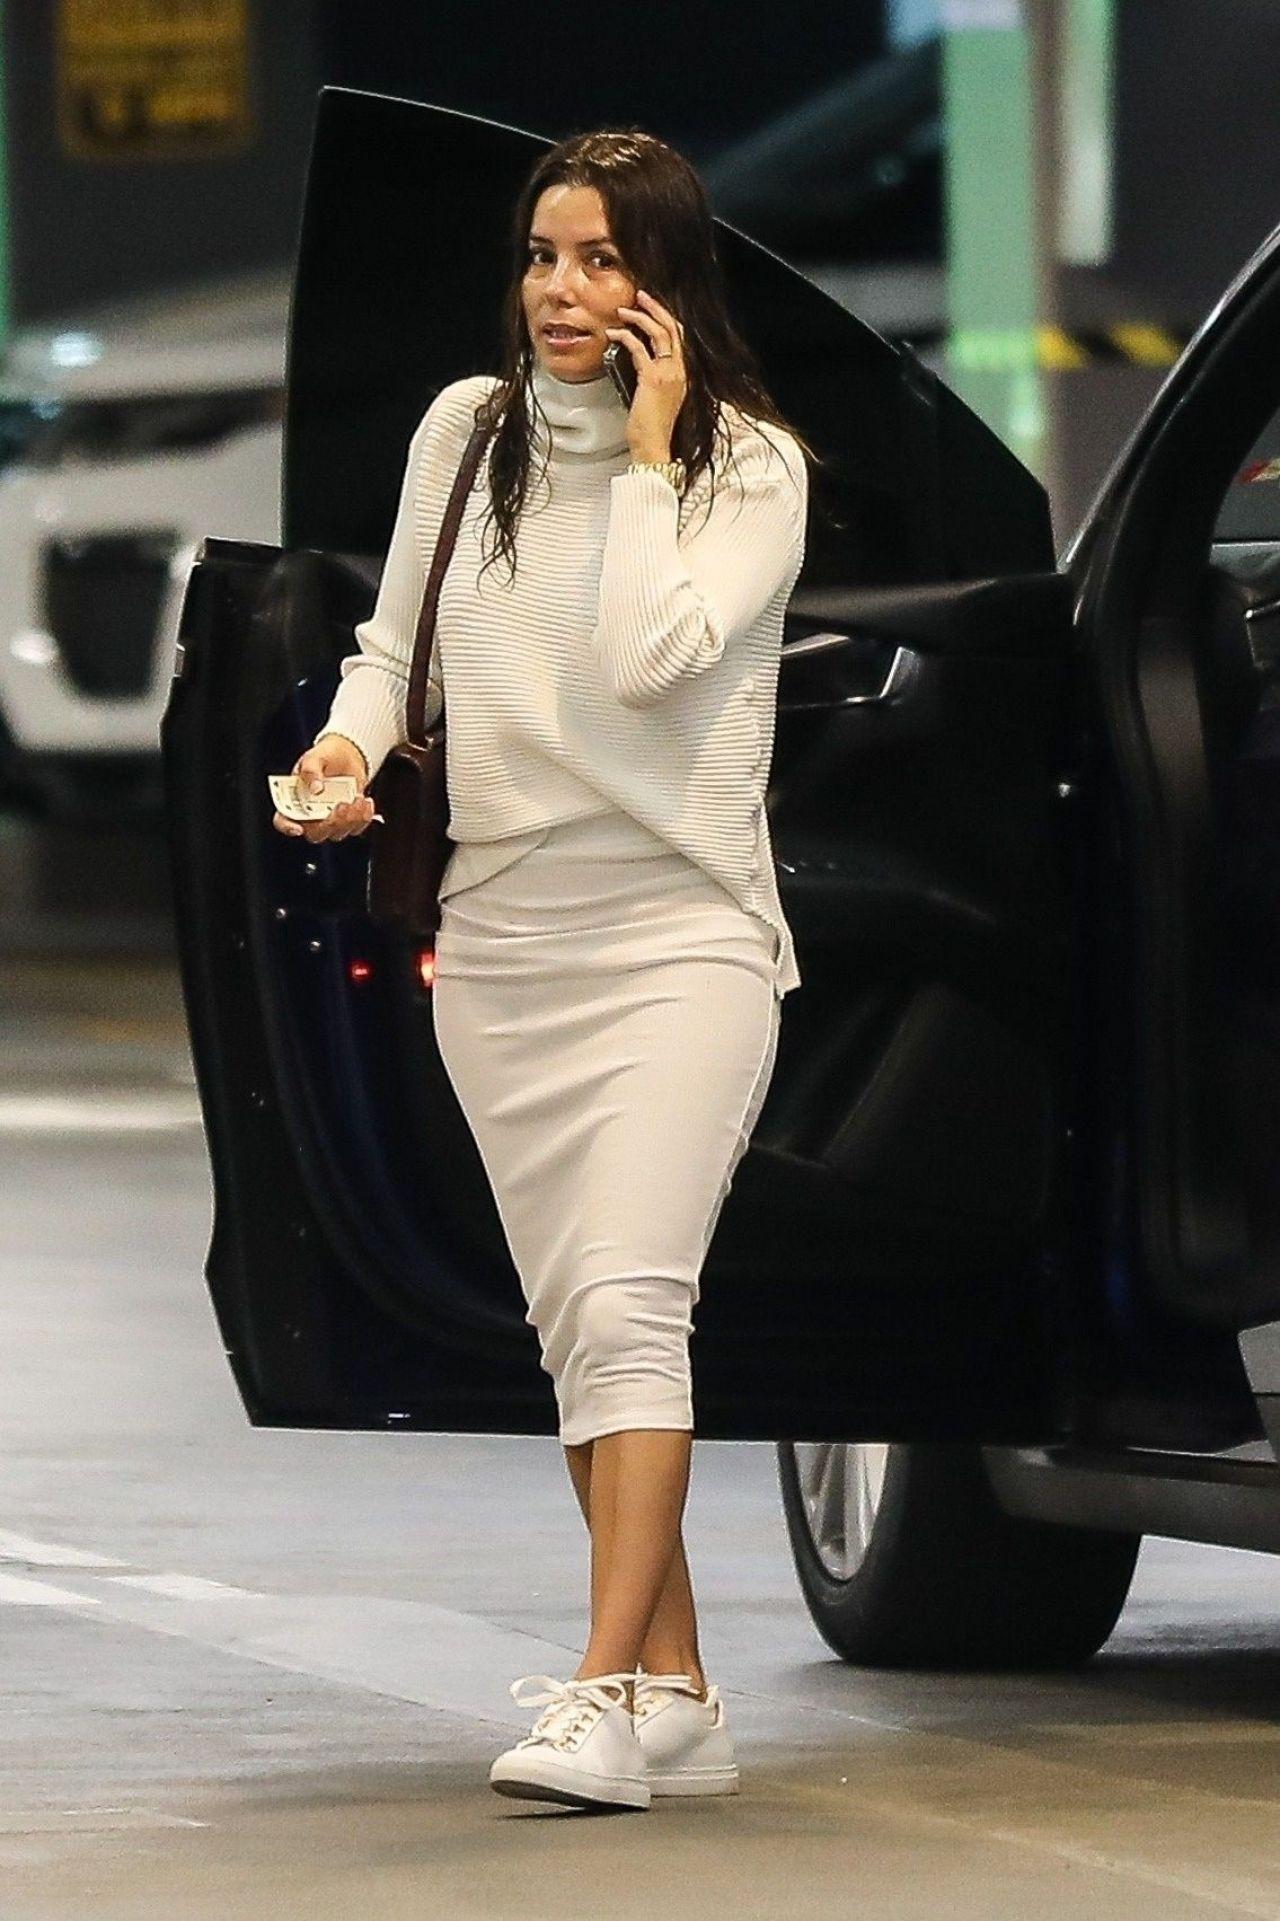 Eva Longoria Soho House In Beverly Hills 11 22 2019